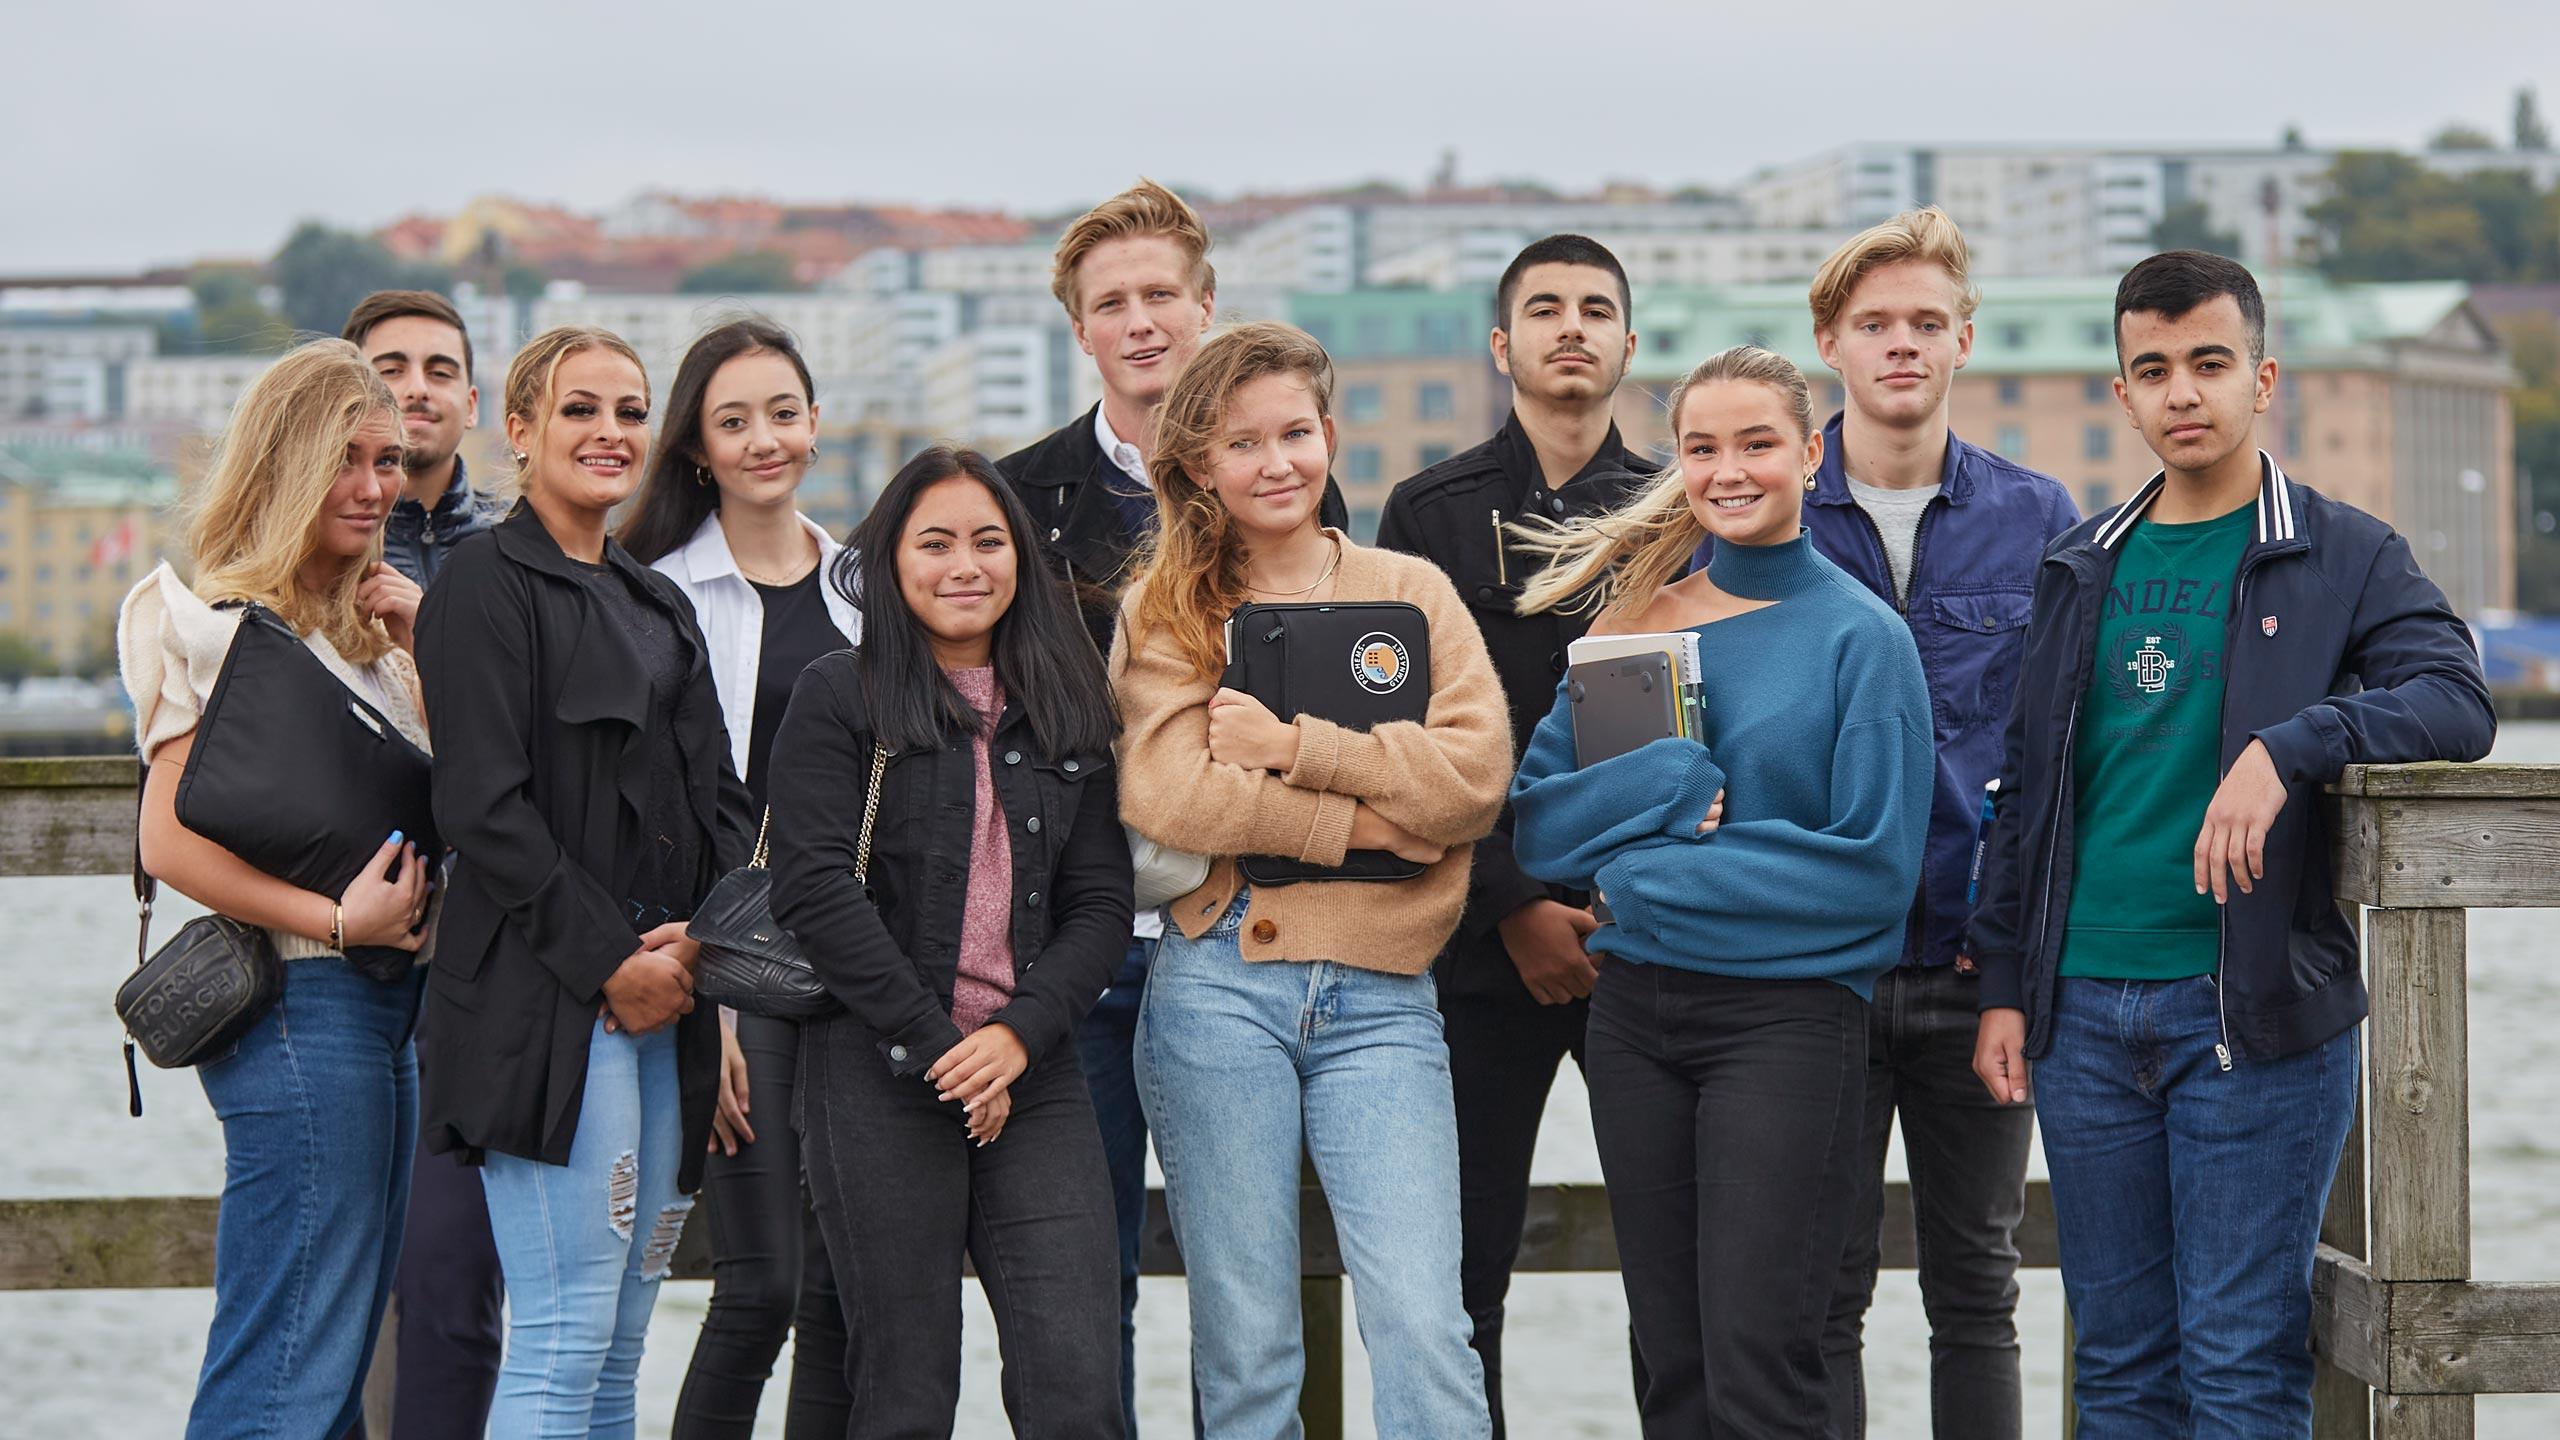 Polhemsgymnasiet elever utomhus